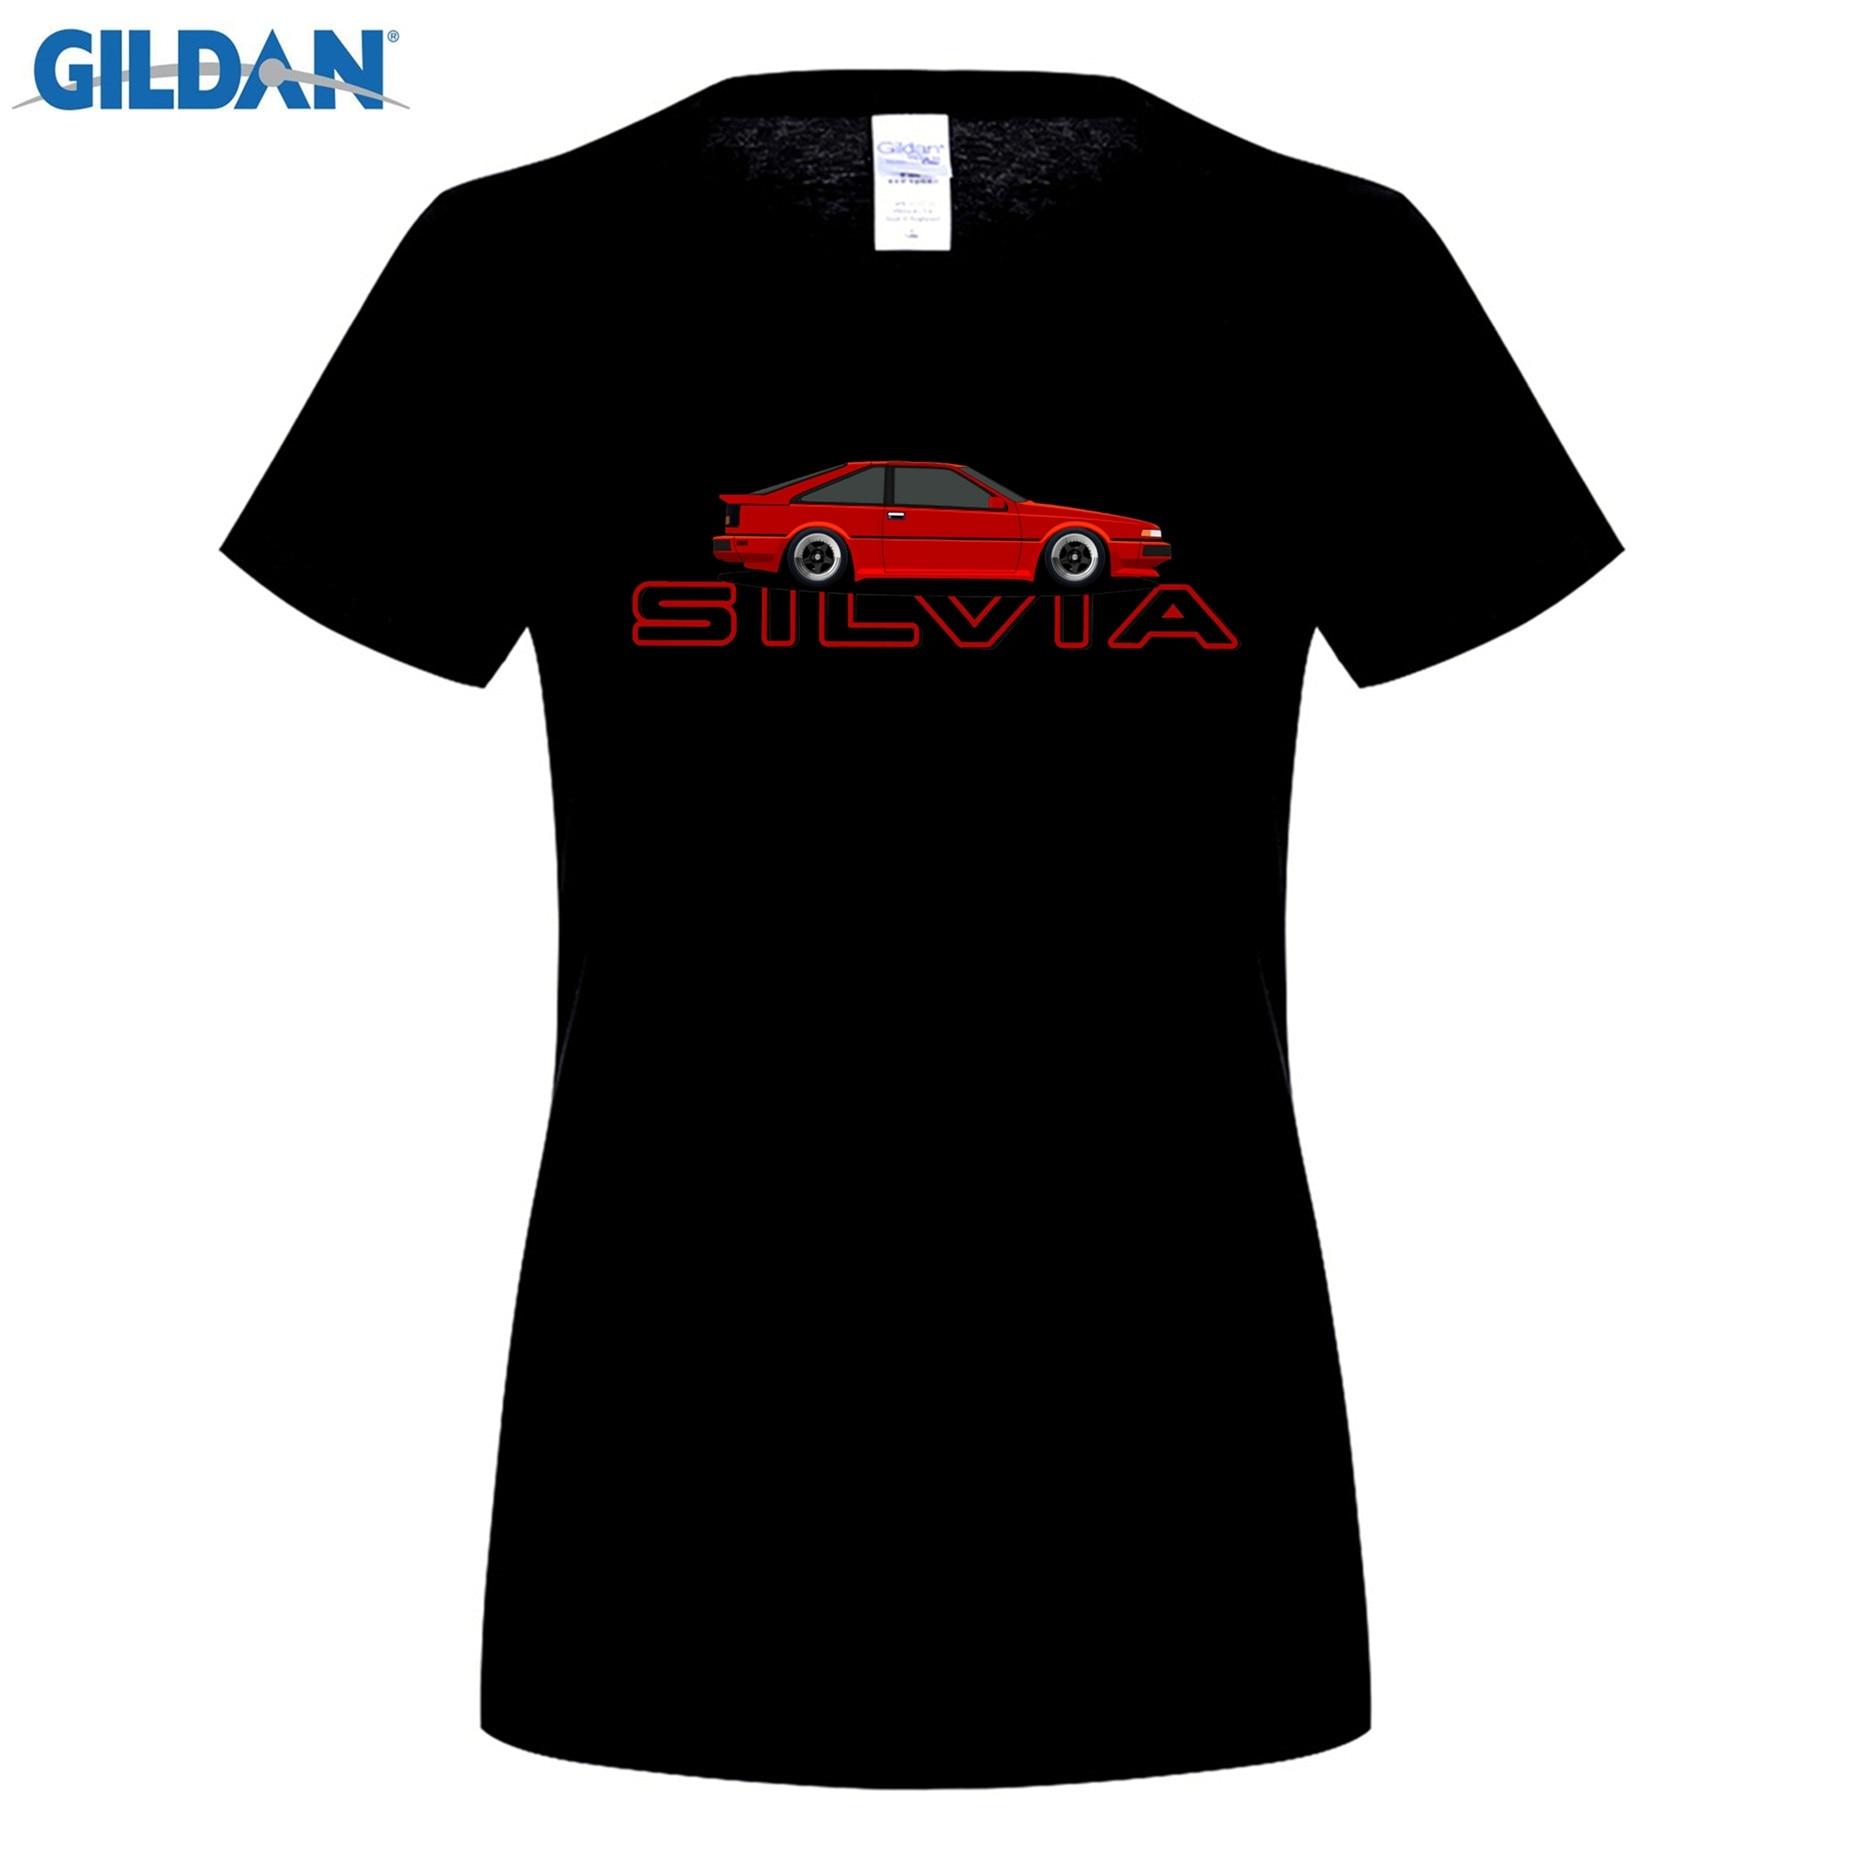 GILDAN Silvia S12 T-Shirt 100% Cotton Car Printed T-Shirt Short Sleeve Shirt Tee Funny Tee gril Youth Gift